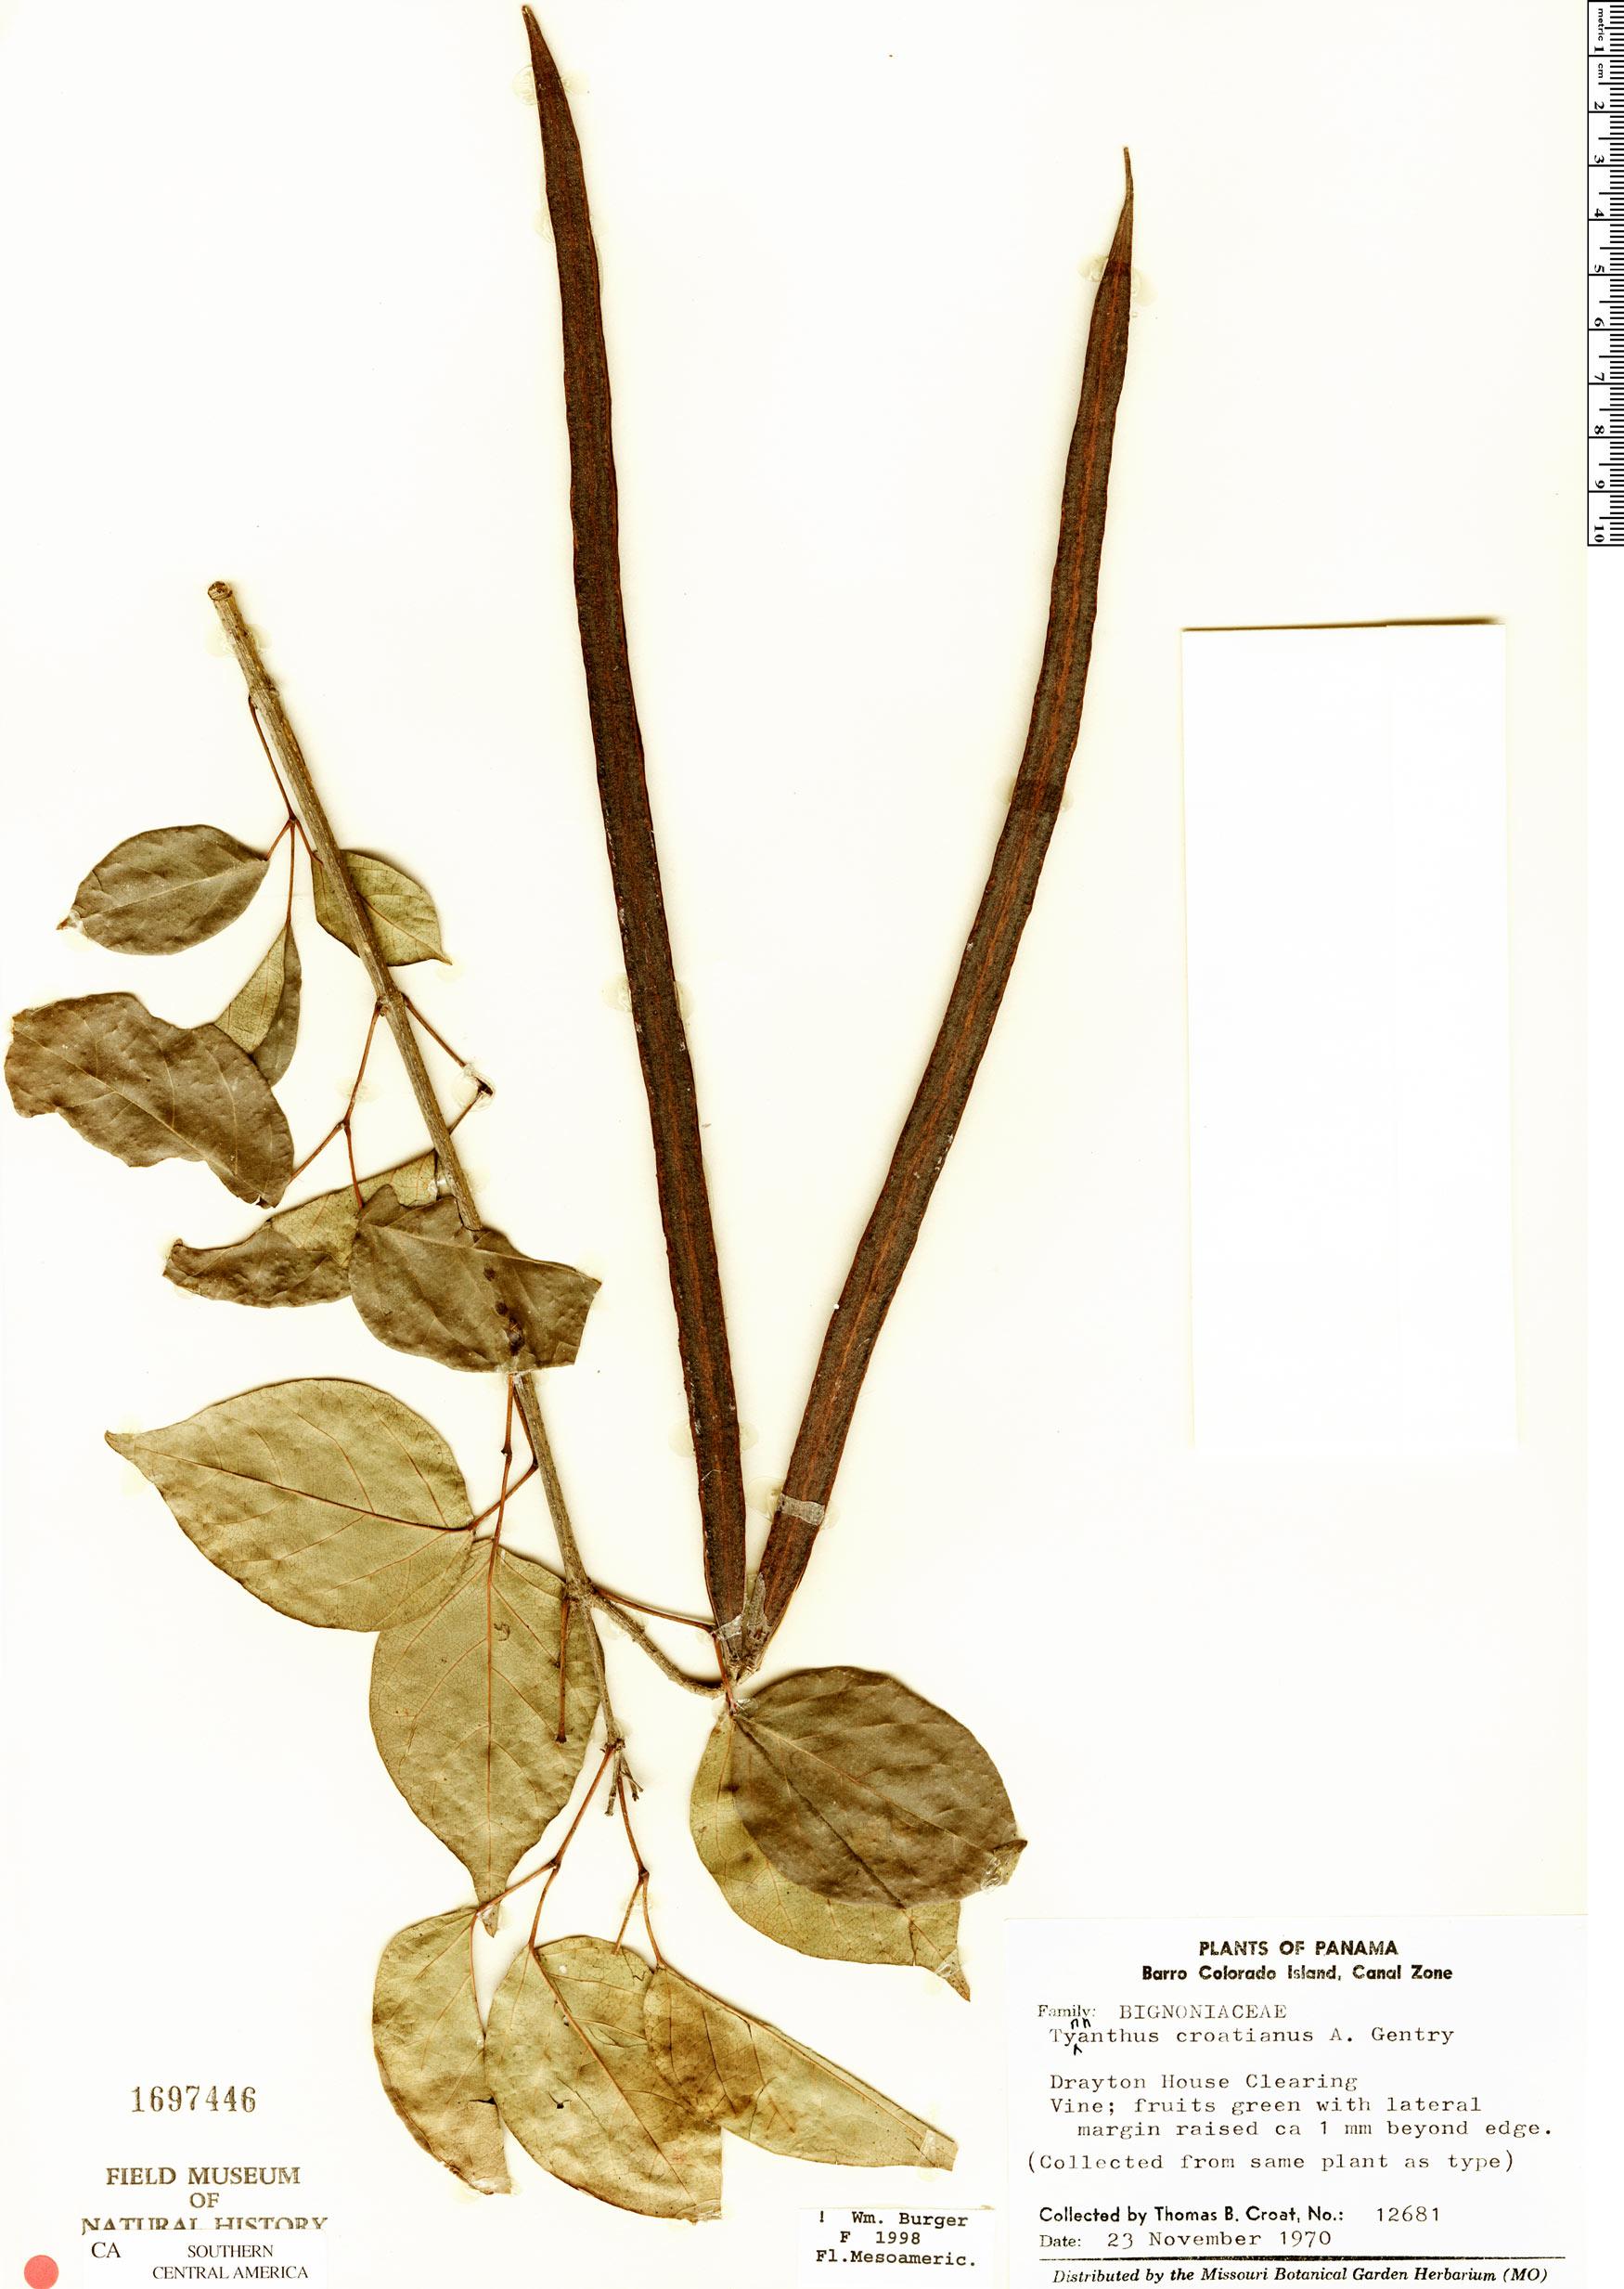 Specimen: Tynanthus croatianus